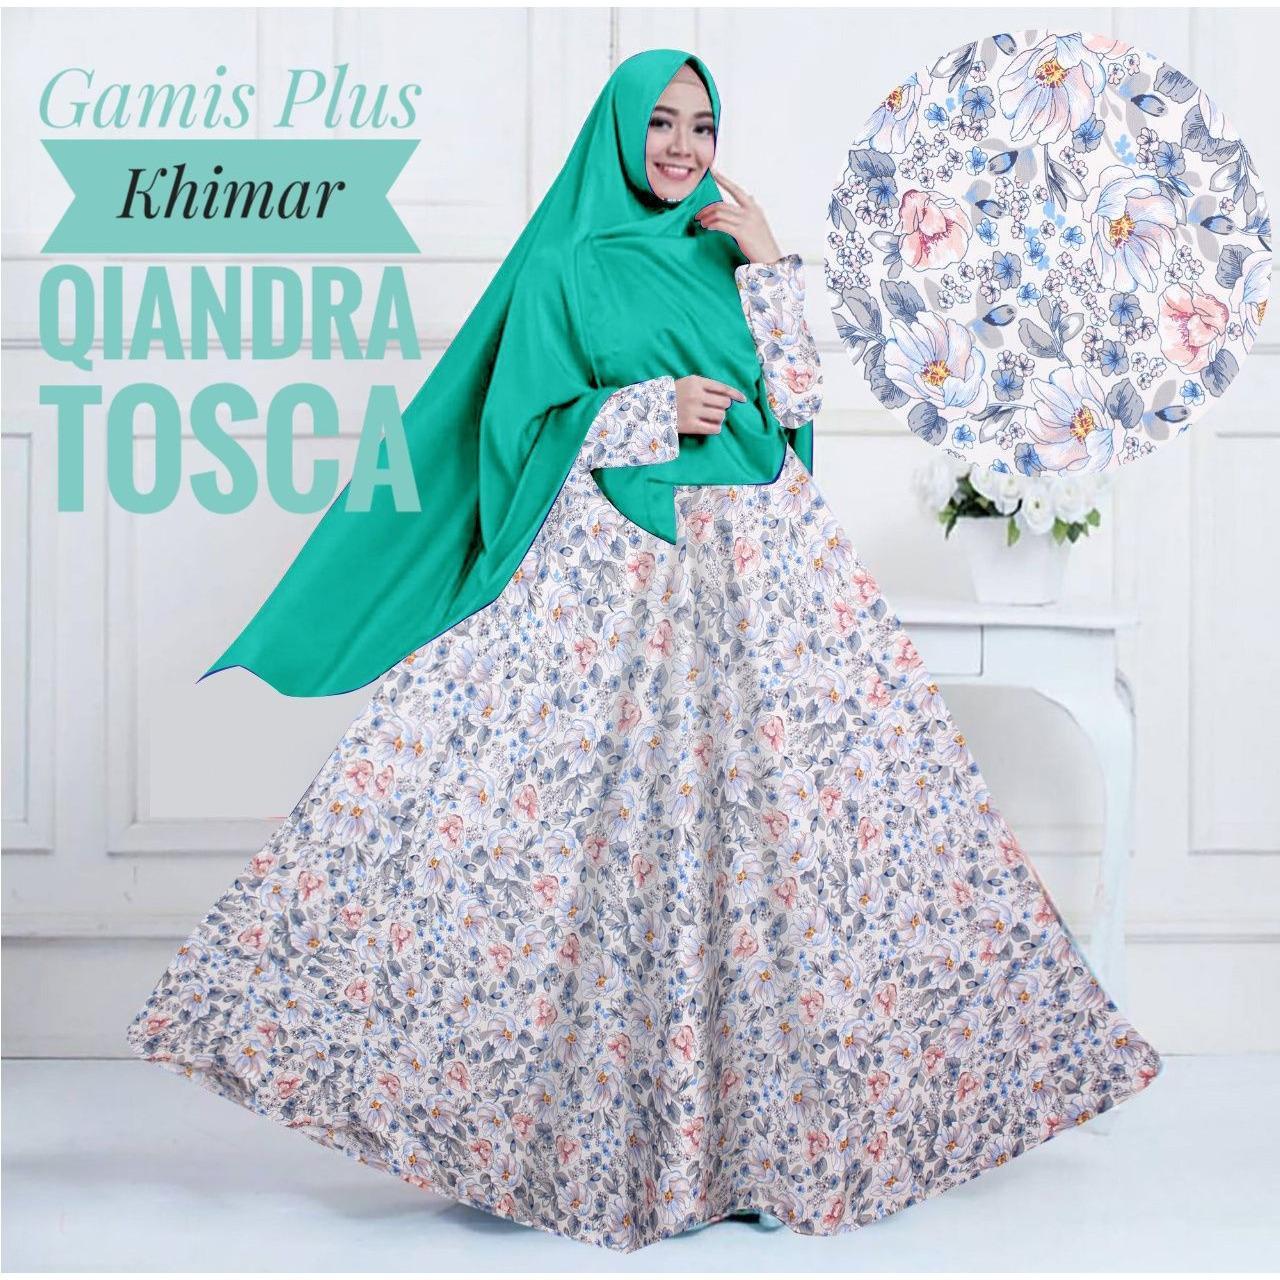 List Harga Gamis Bahan Baloteli Termurah 2018 Cekharga Syari Afida Dress Ter Super Qiandra Plus Khimar Warna Tosca